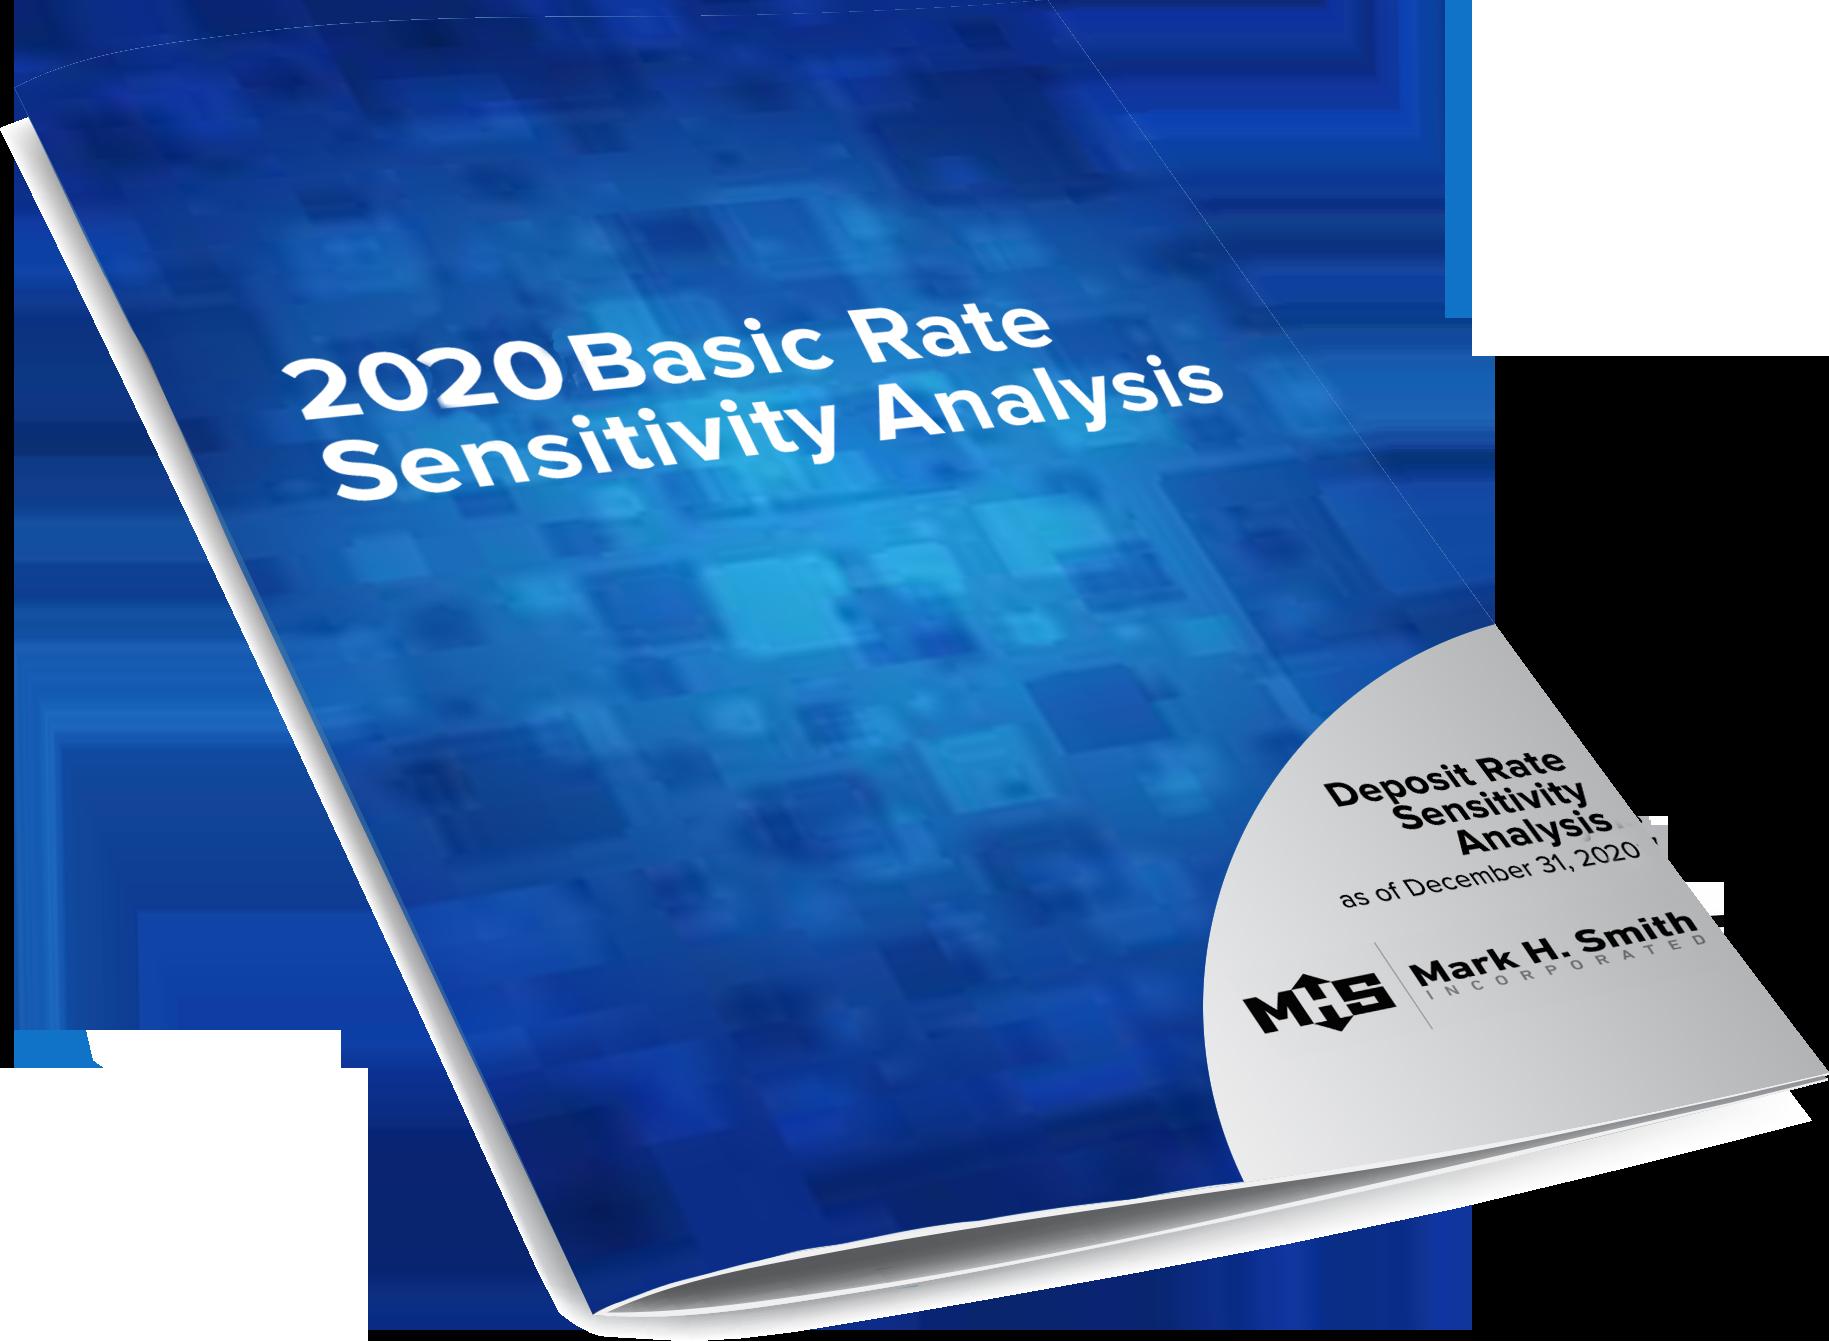 Credit Union Basic Rate Sensitivity Analysis